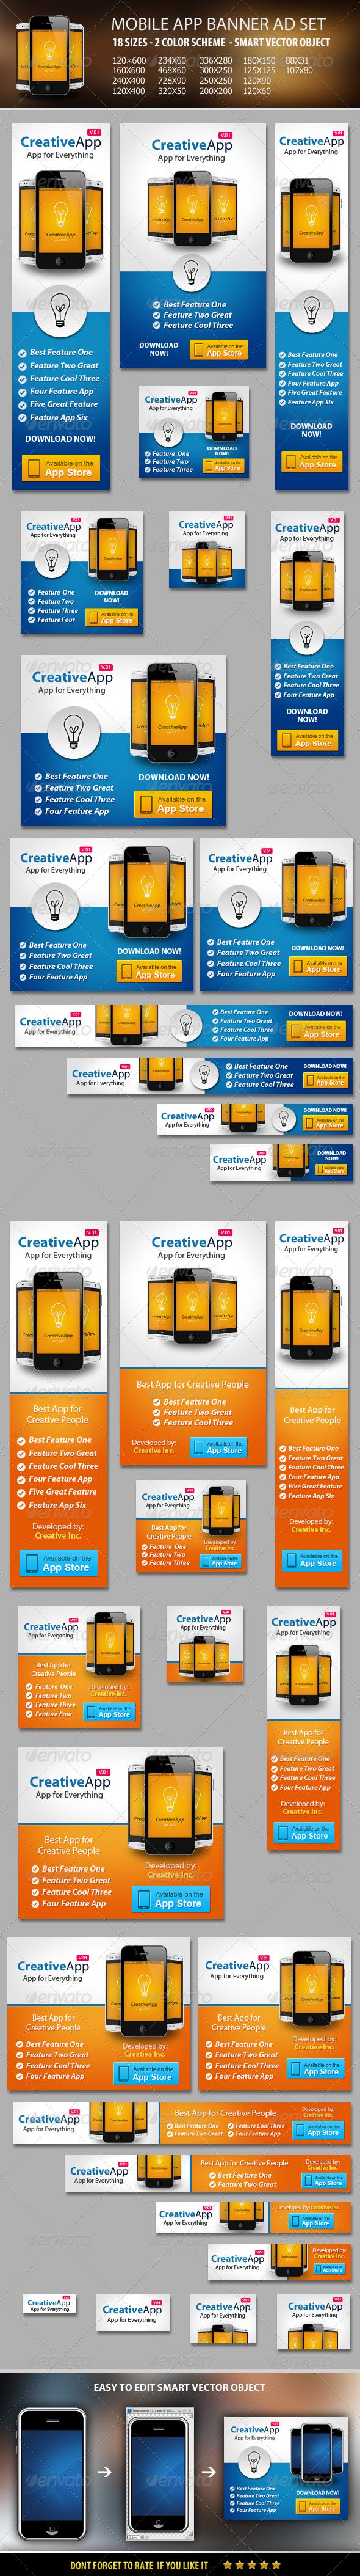 GraphicRiver Mobile App Banner ad Set 5843731